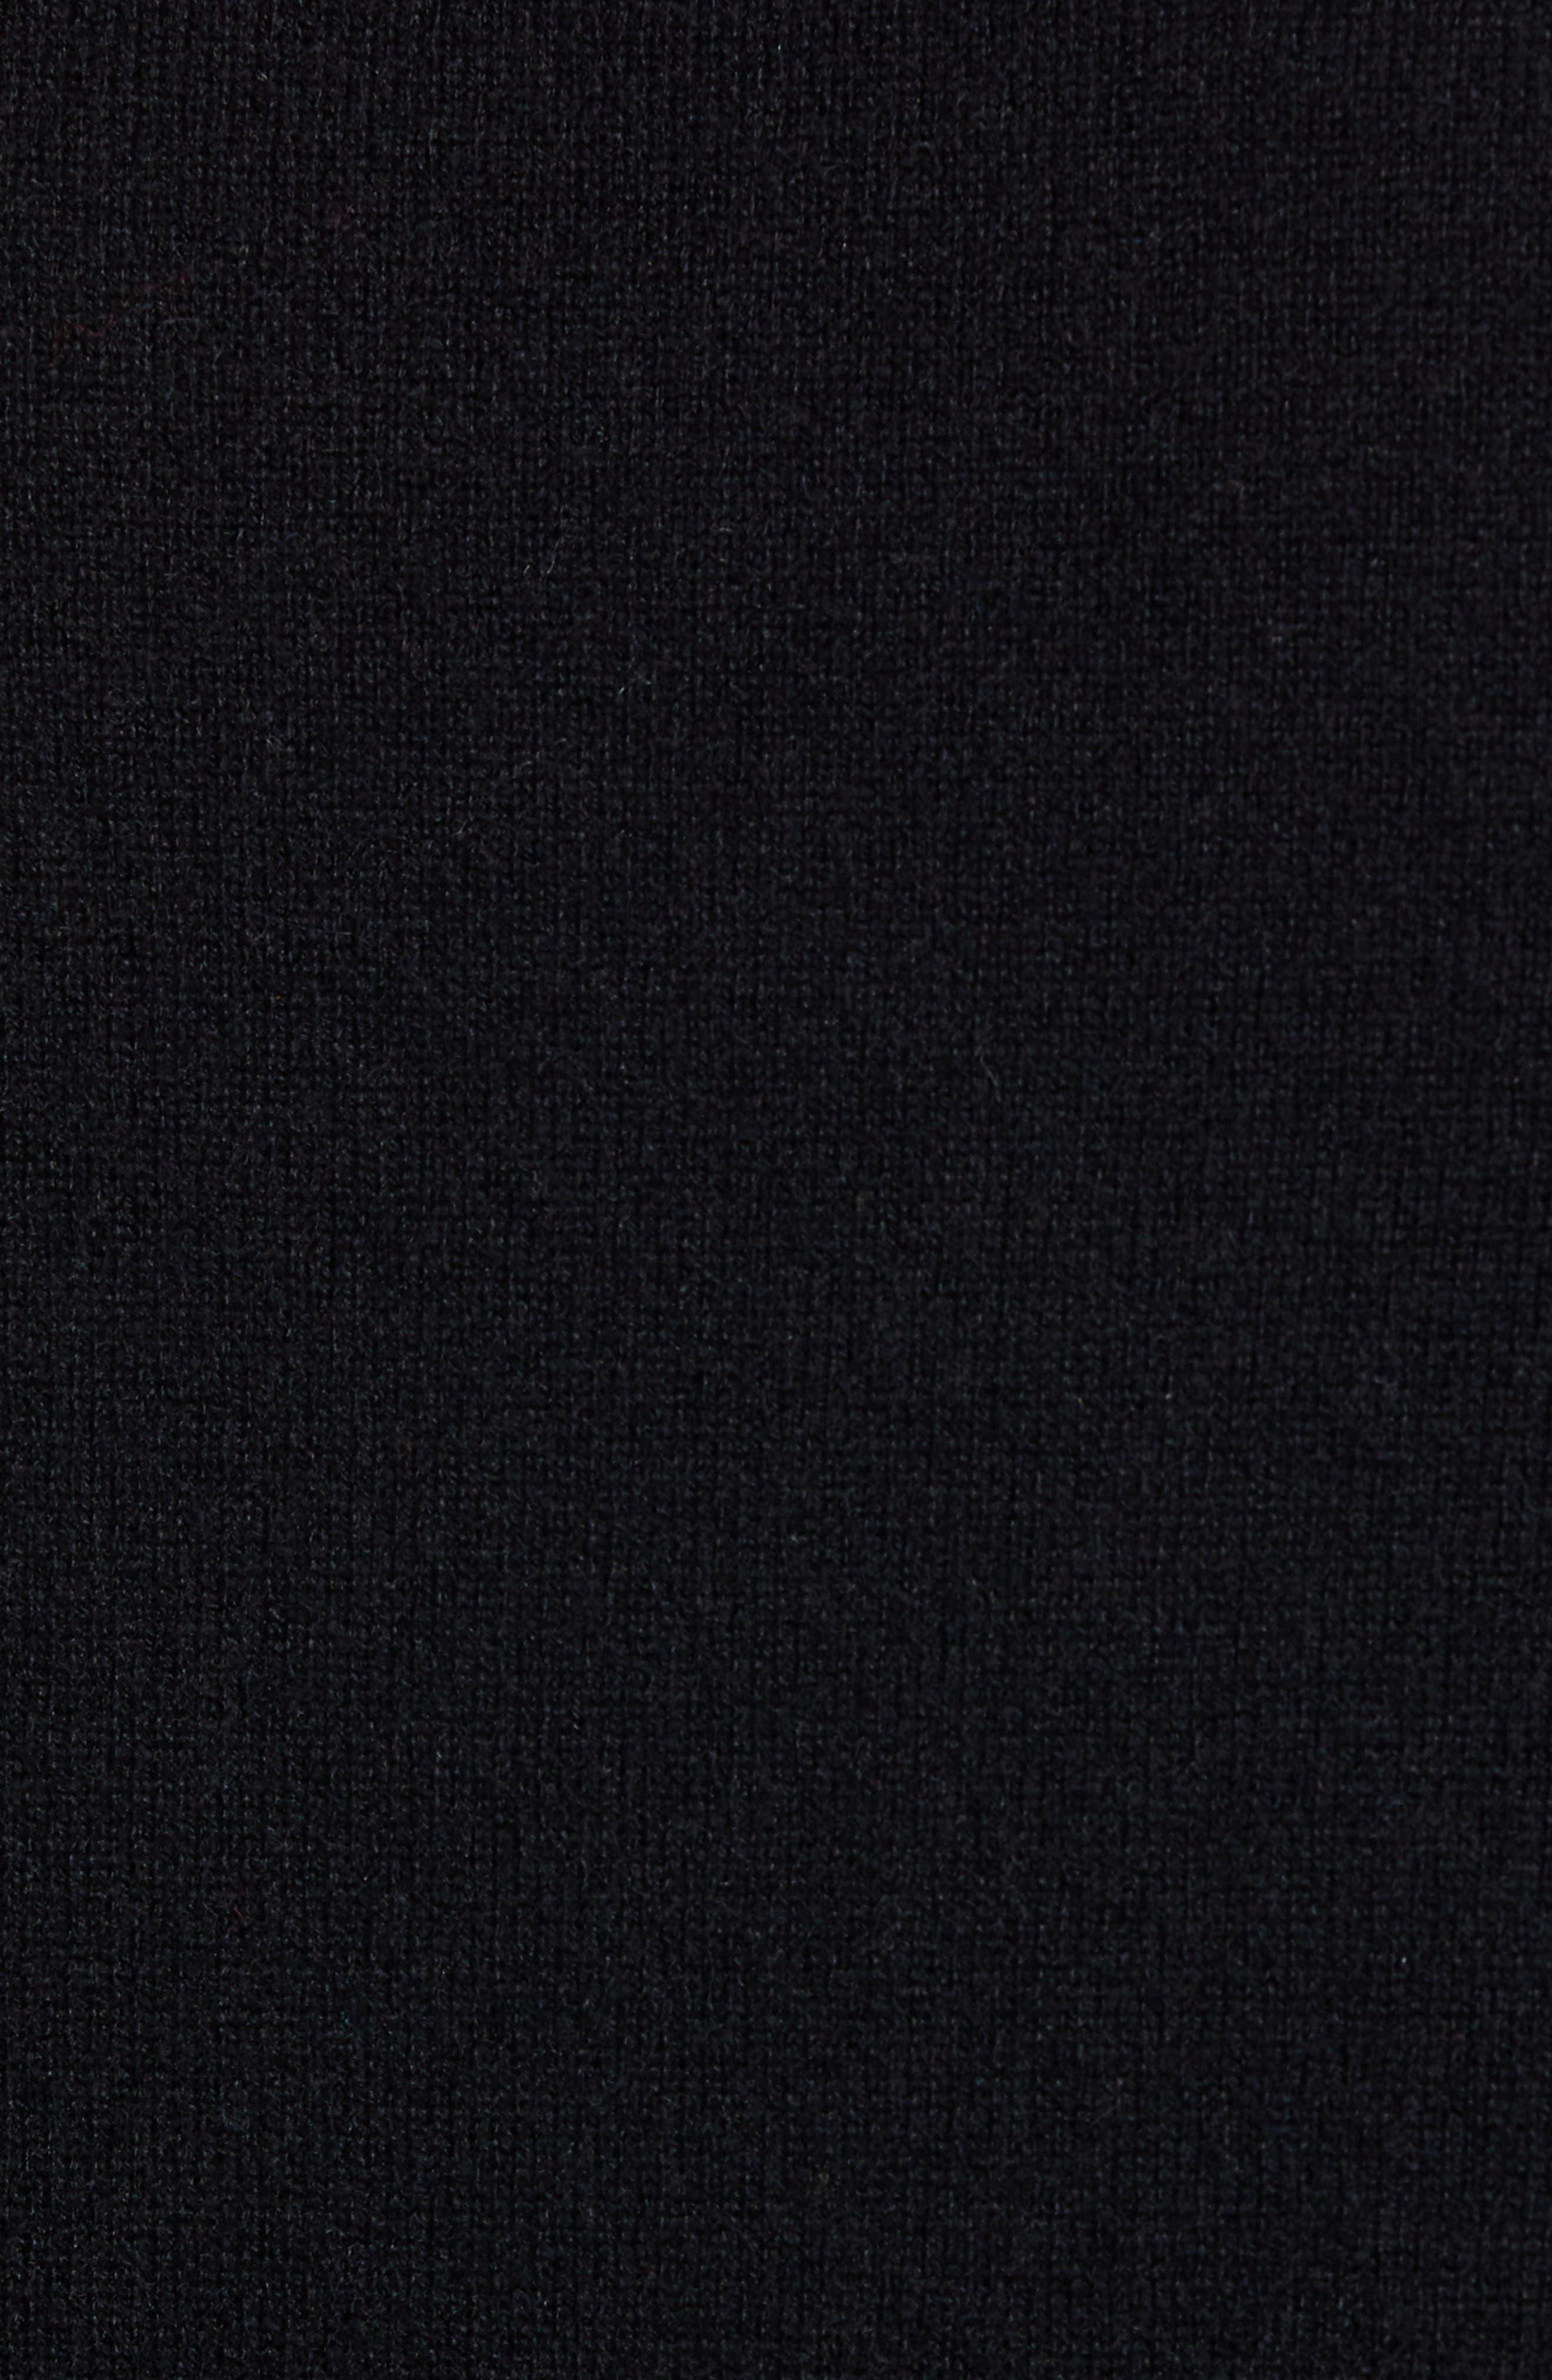 Regular Fit Wool & Cashmere Sweater,                             Alternate thumbnail 5, color,                             BLACK CAVIAR